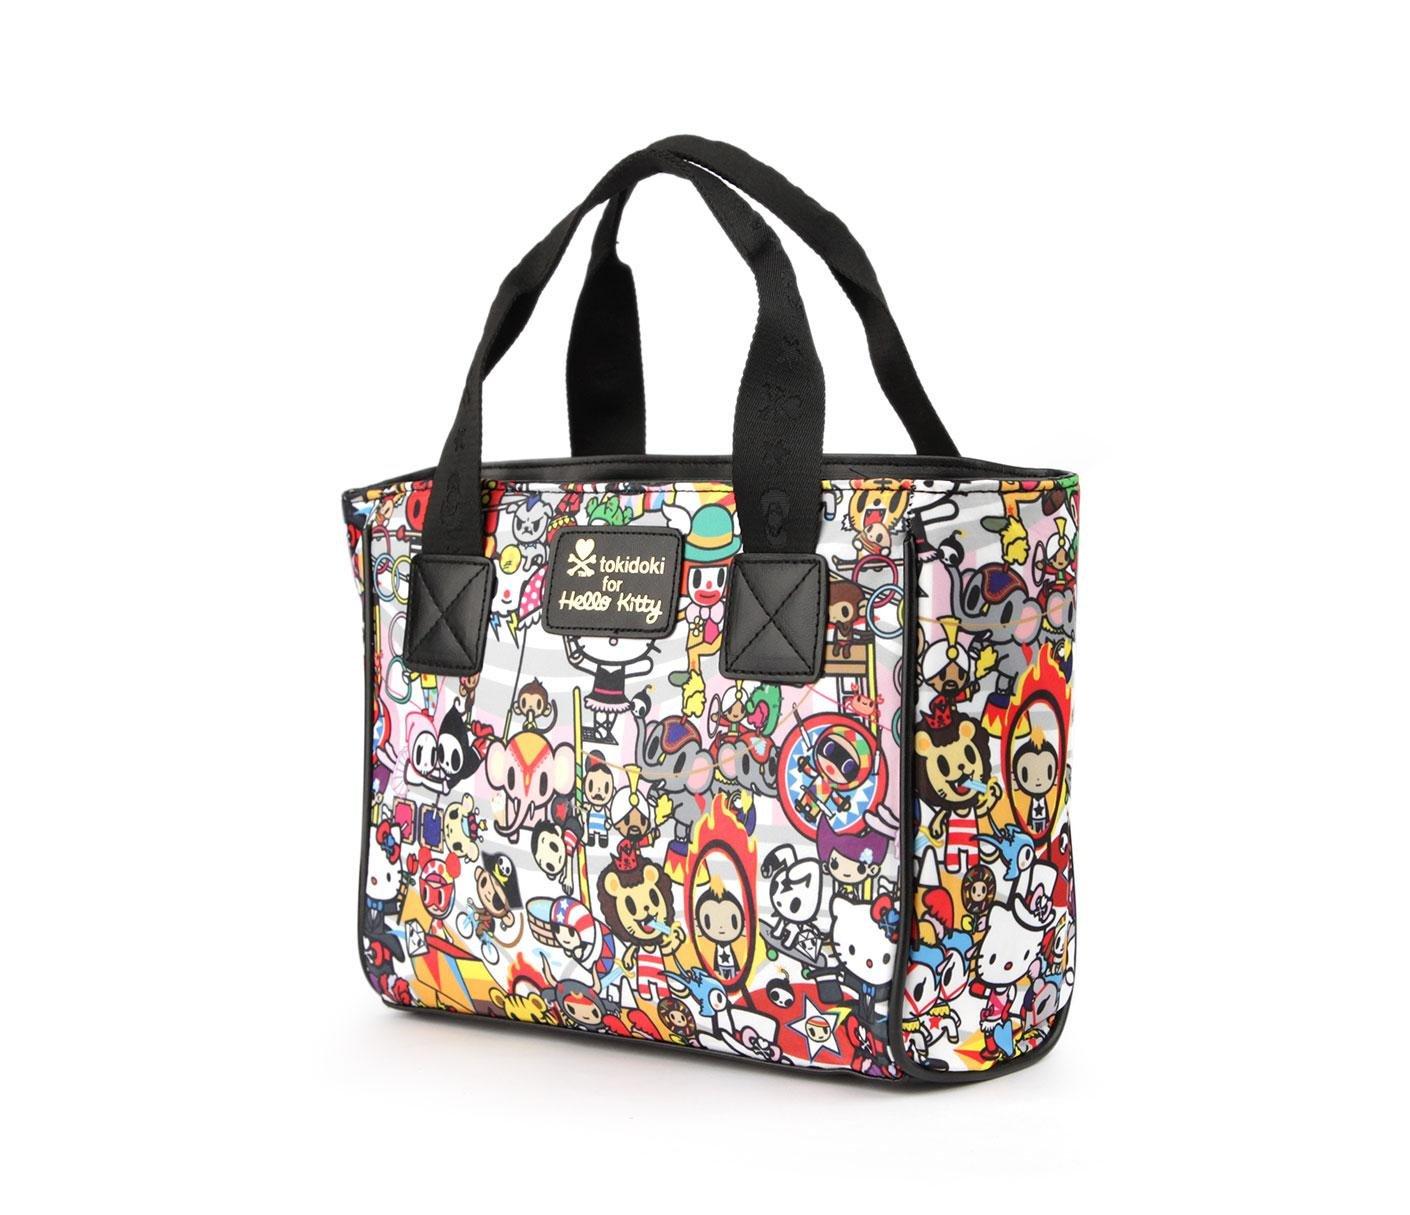 a630a8bdb Amazon.com : tokidoki X Hello Kitty Handbag Bag : Beauty